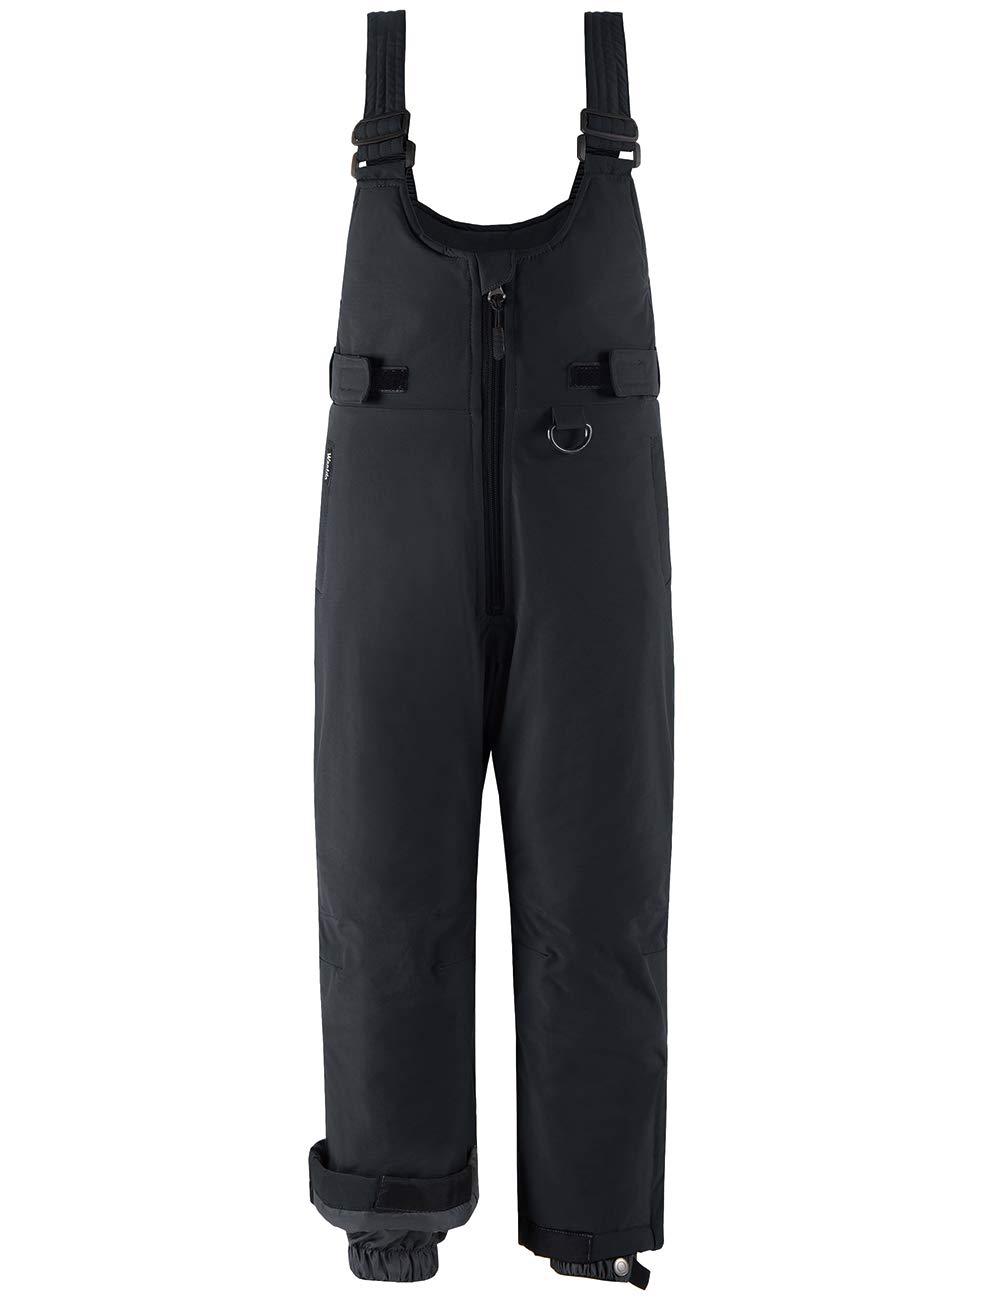 Wantdo Boy's Waterproof Skiing Bibs Fleece Lined Snow Pants